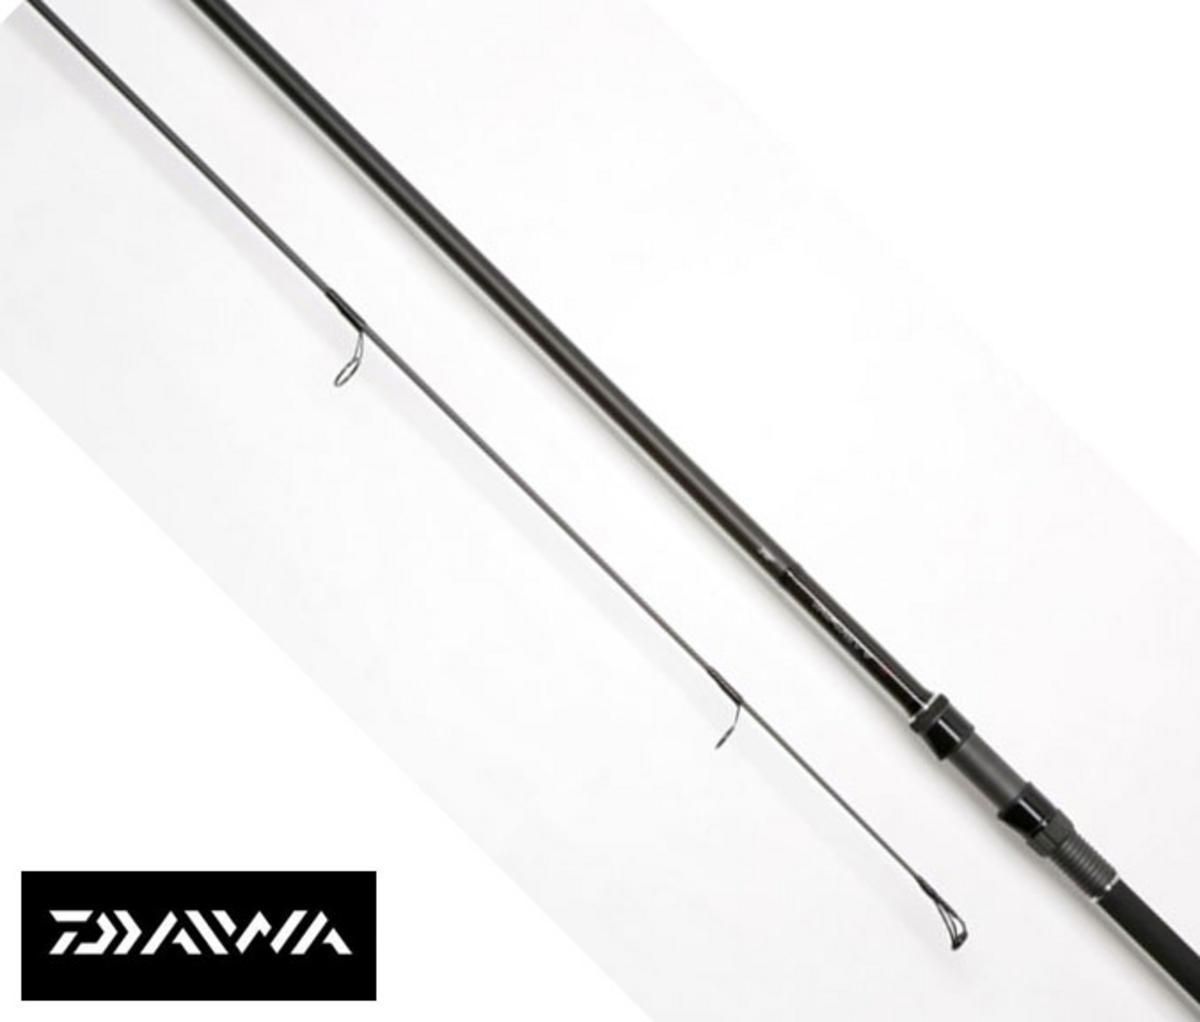 New Daiwa Infinity Df X45 Carp Rod 12 3 25lb T C Model